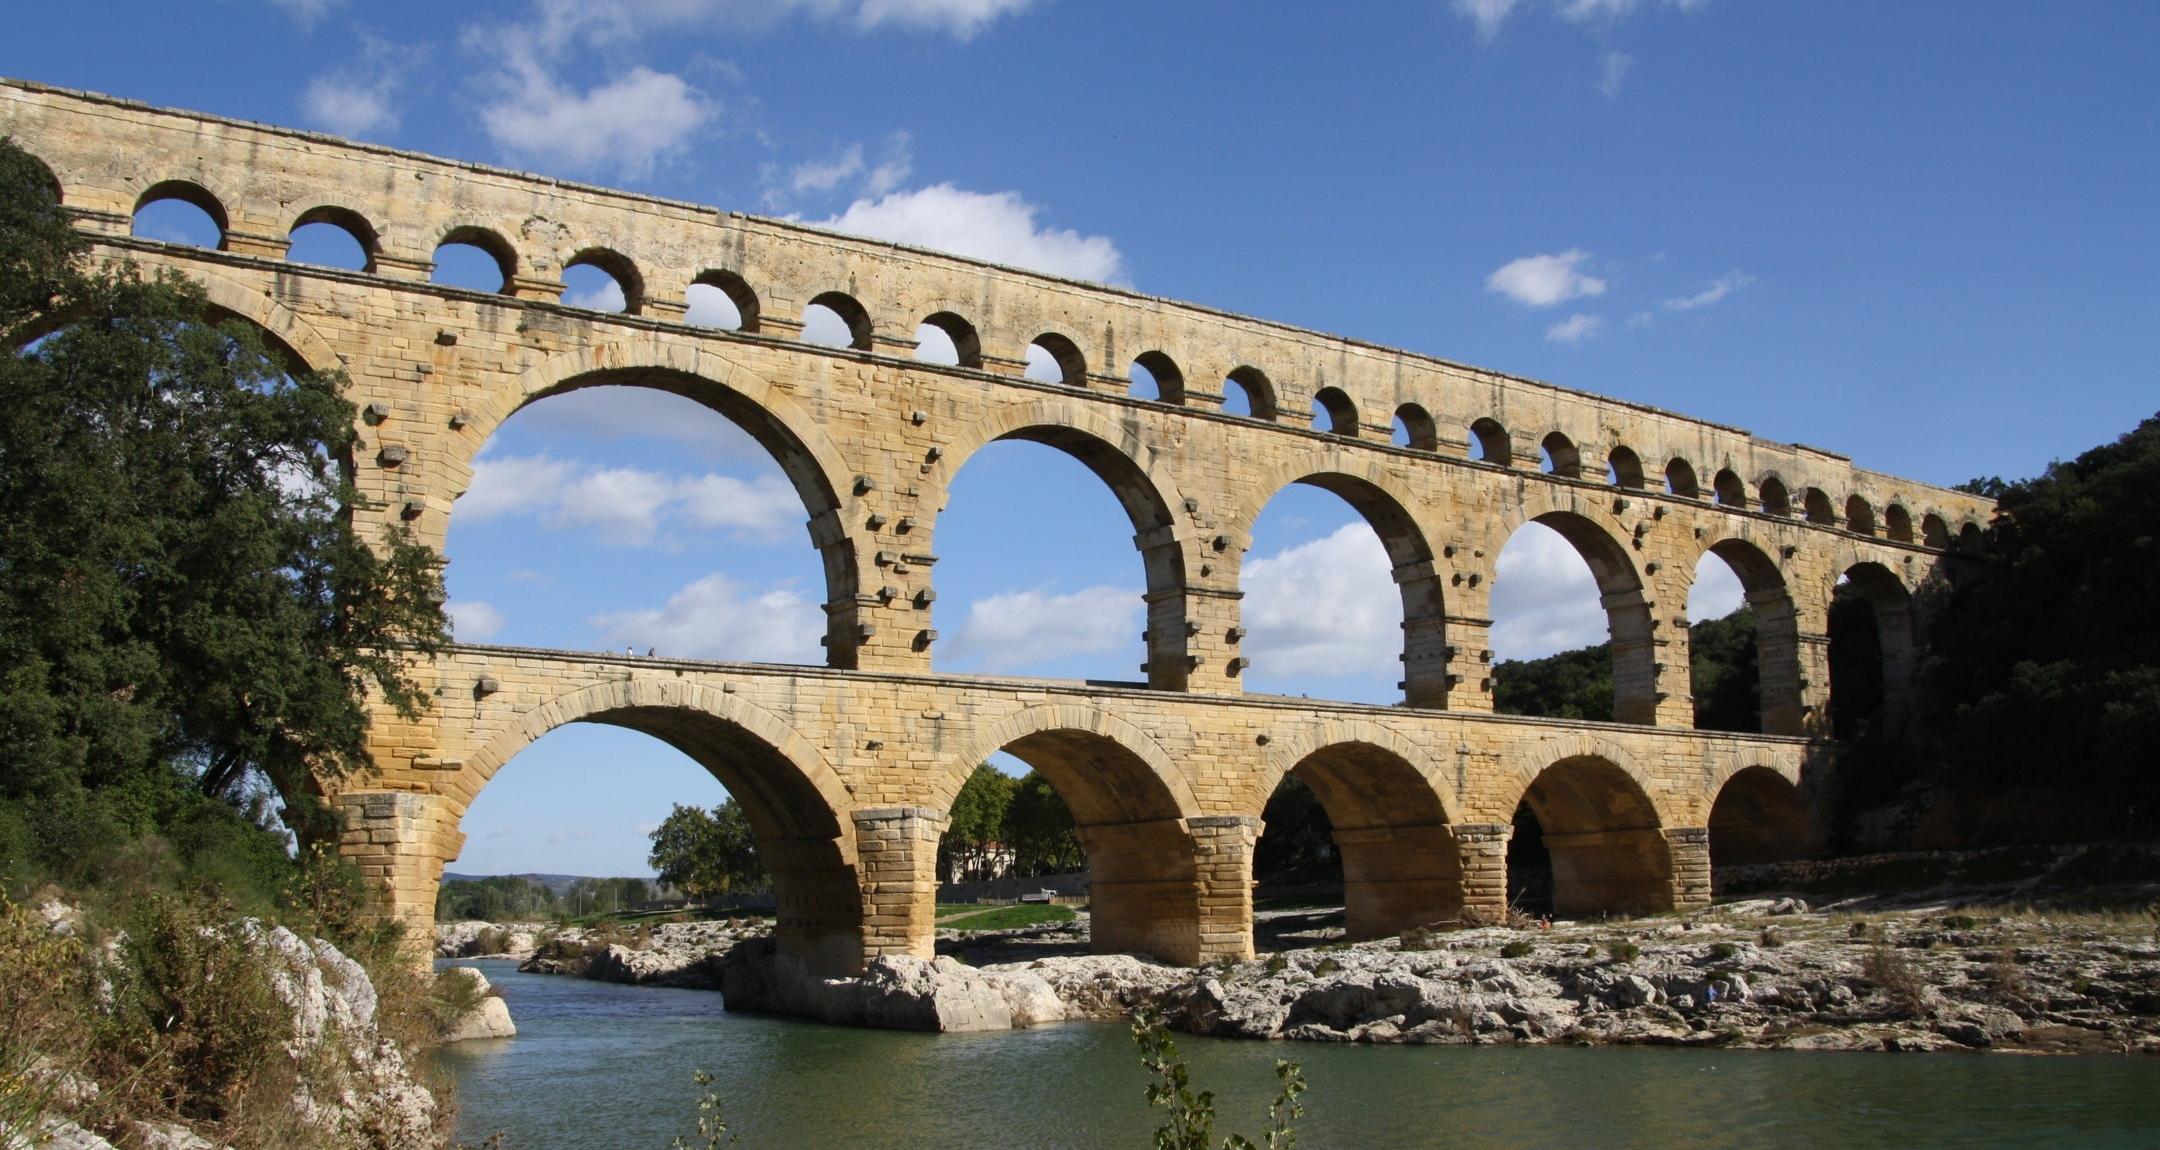 Pont Du Gard Avignon France Auto Electrical Wiring Diagram Pvg Burnham Gas Boilers